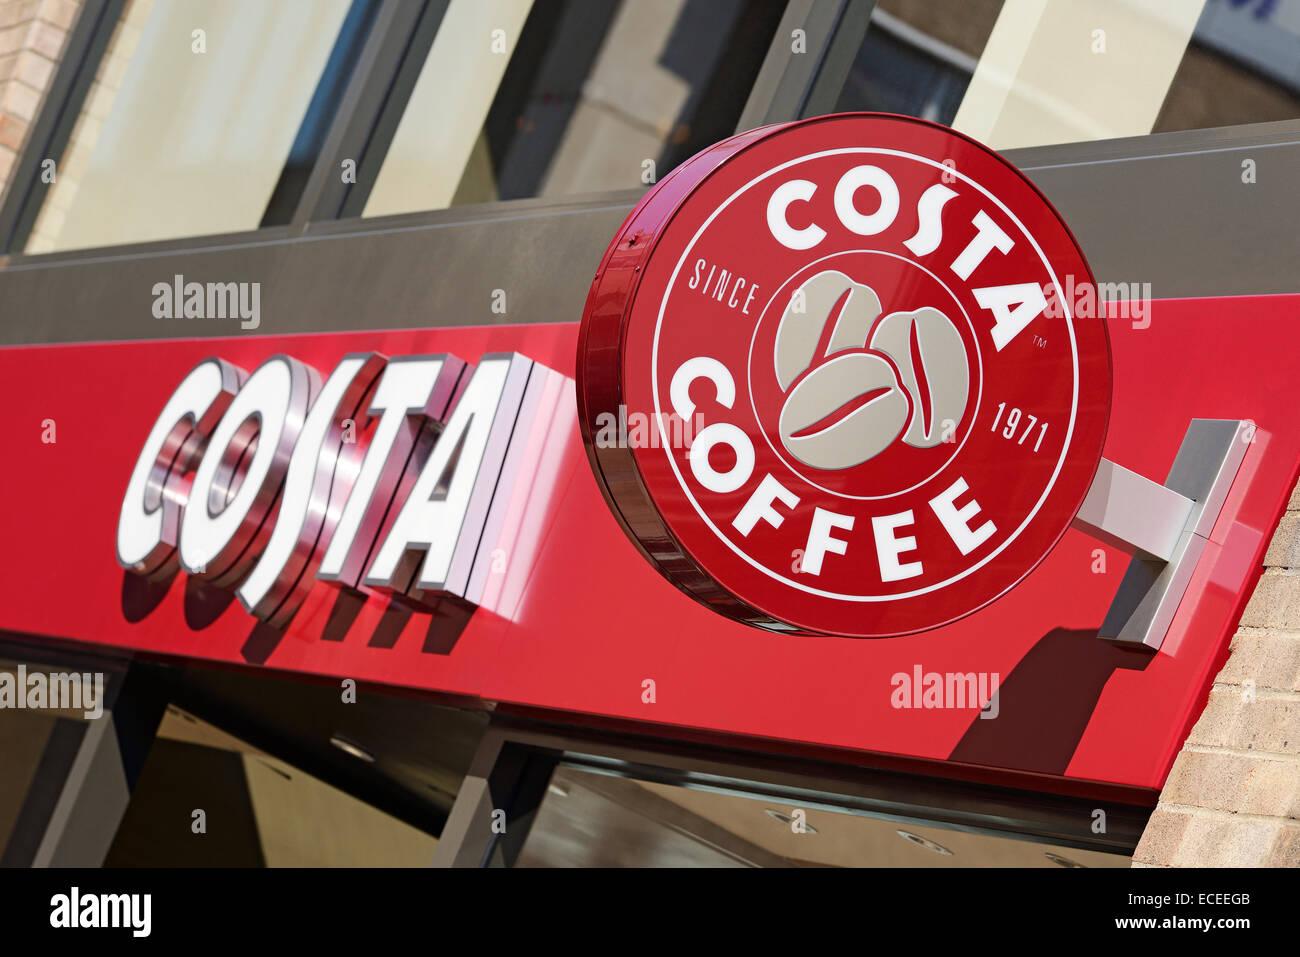 Costa Coffee, UK. Photo Stock